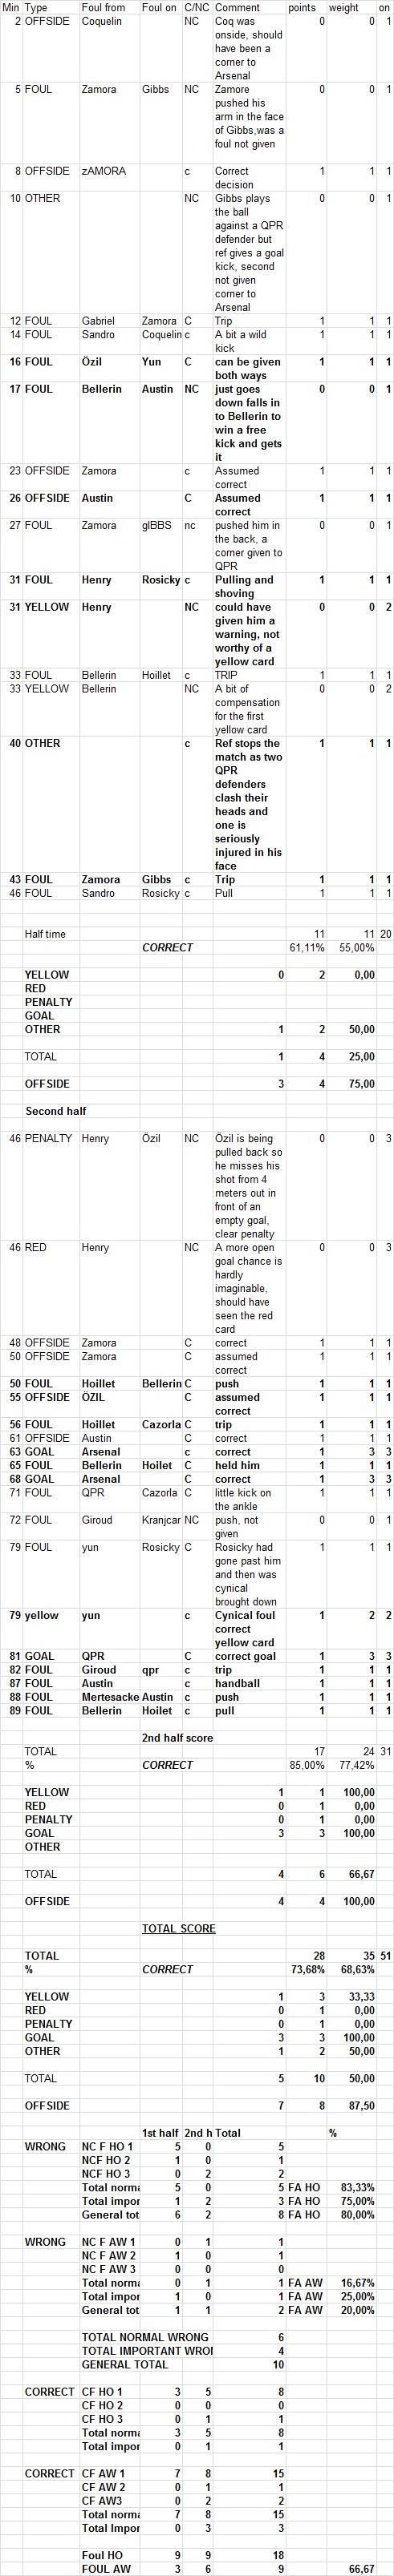 QPR Arsenal